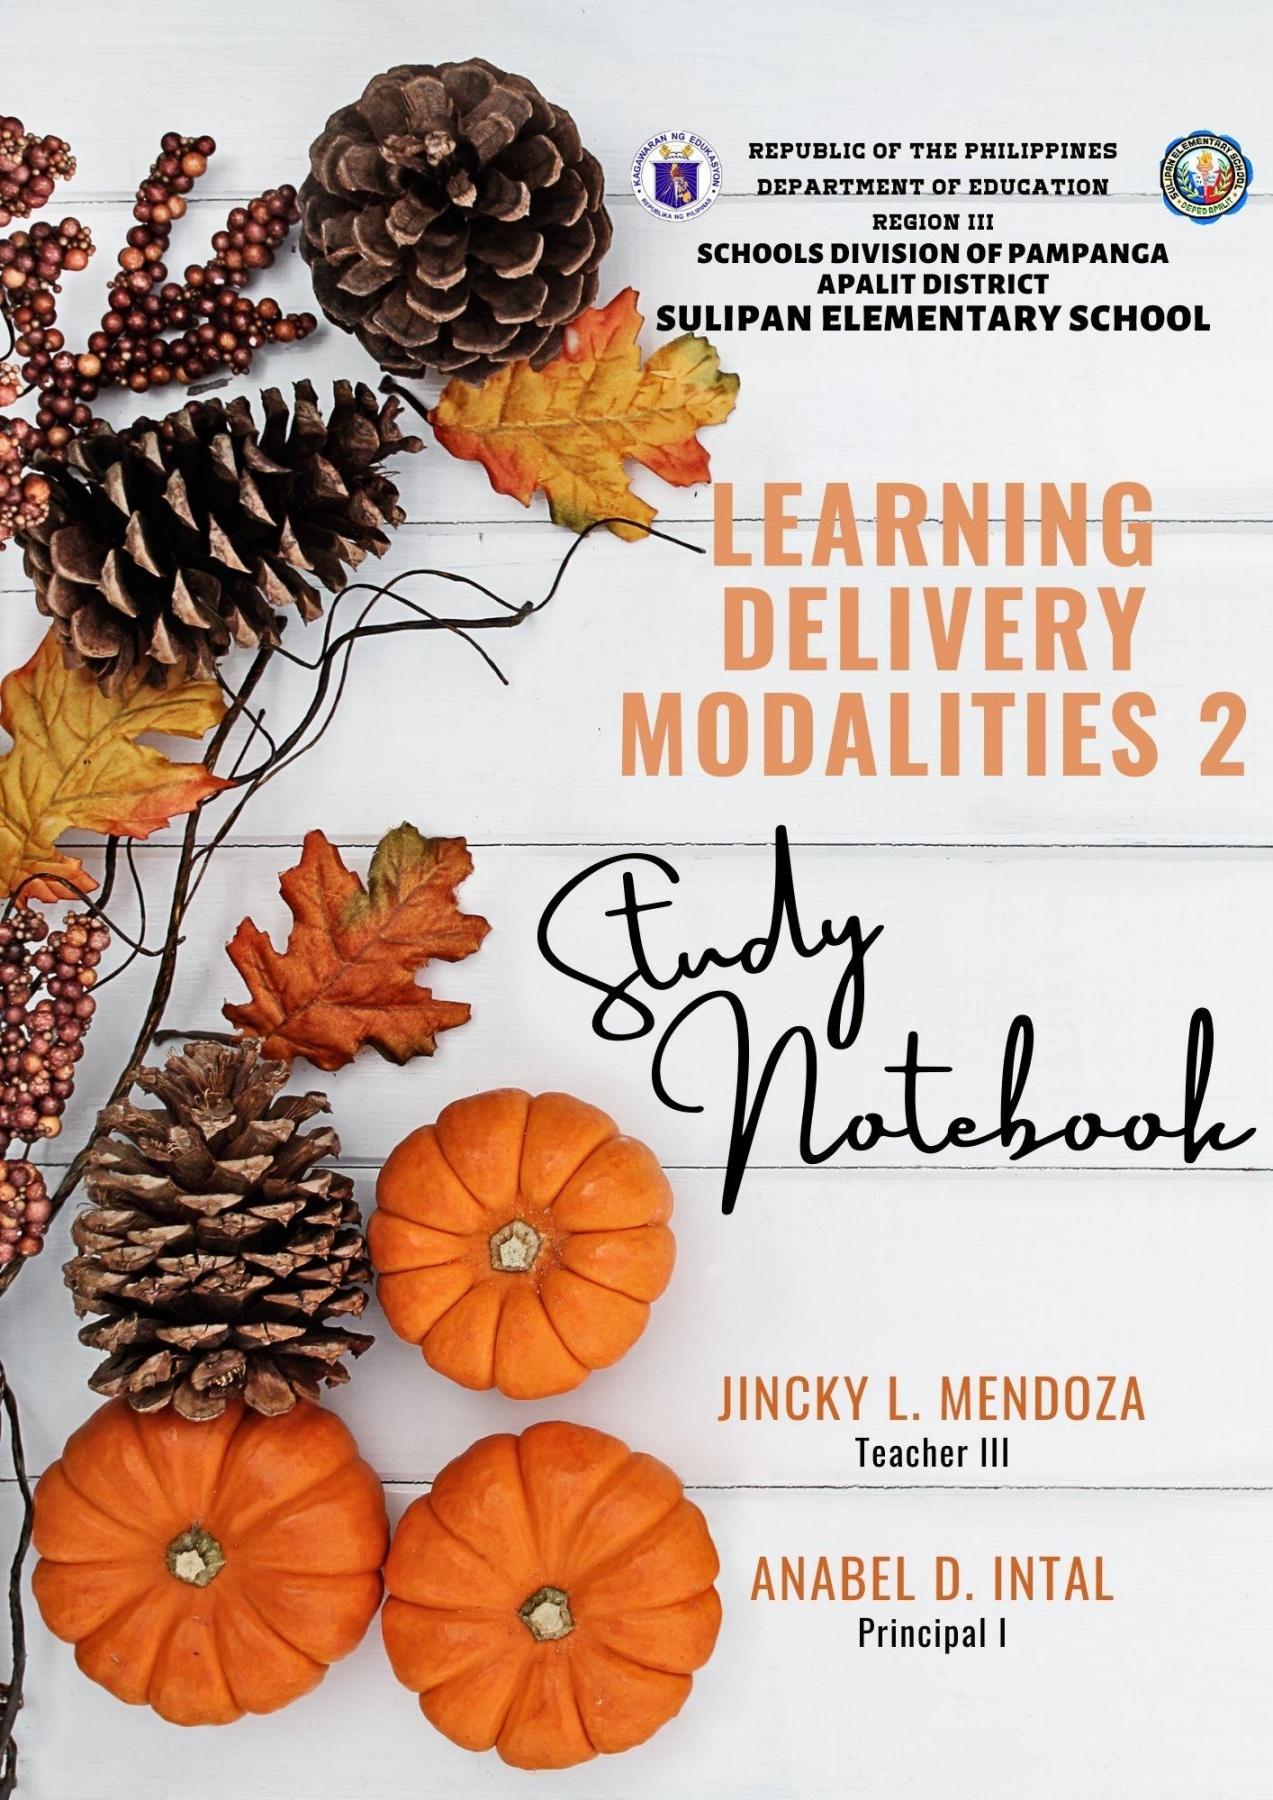 medium resolution of JMENDOZA_LDM2_STUDY_NOTEBOOK-Flip eBook Pages 1 - 48  AnyFlip   AnyFlip